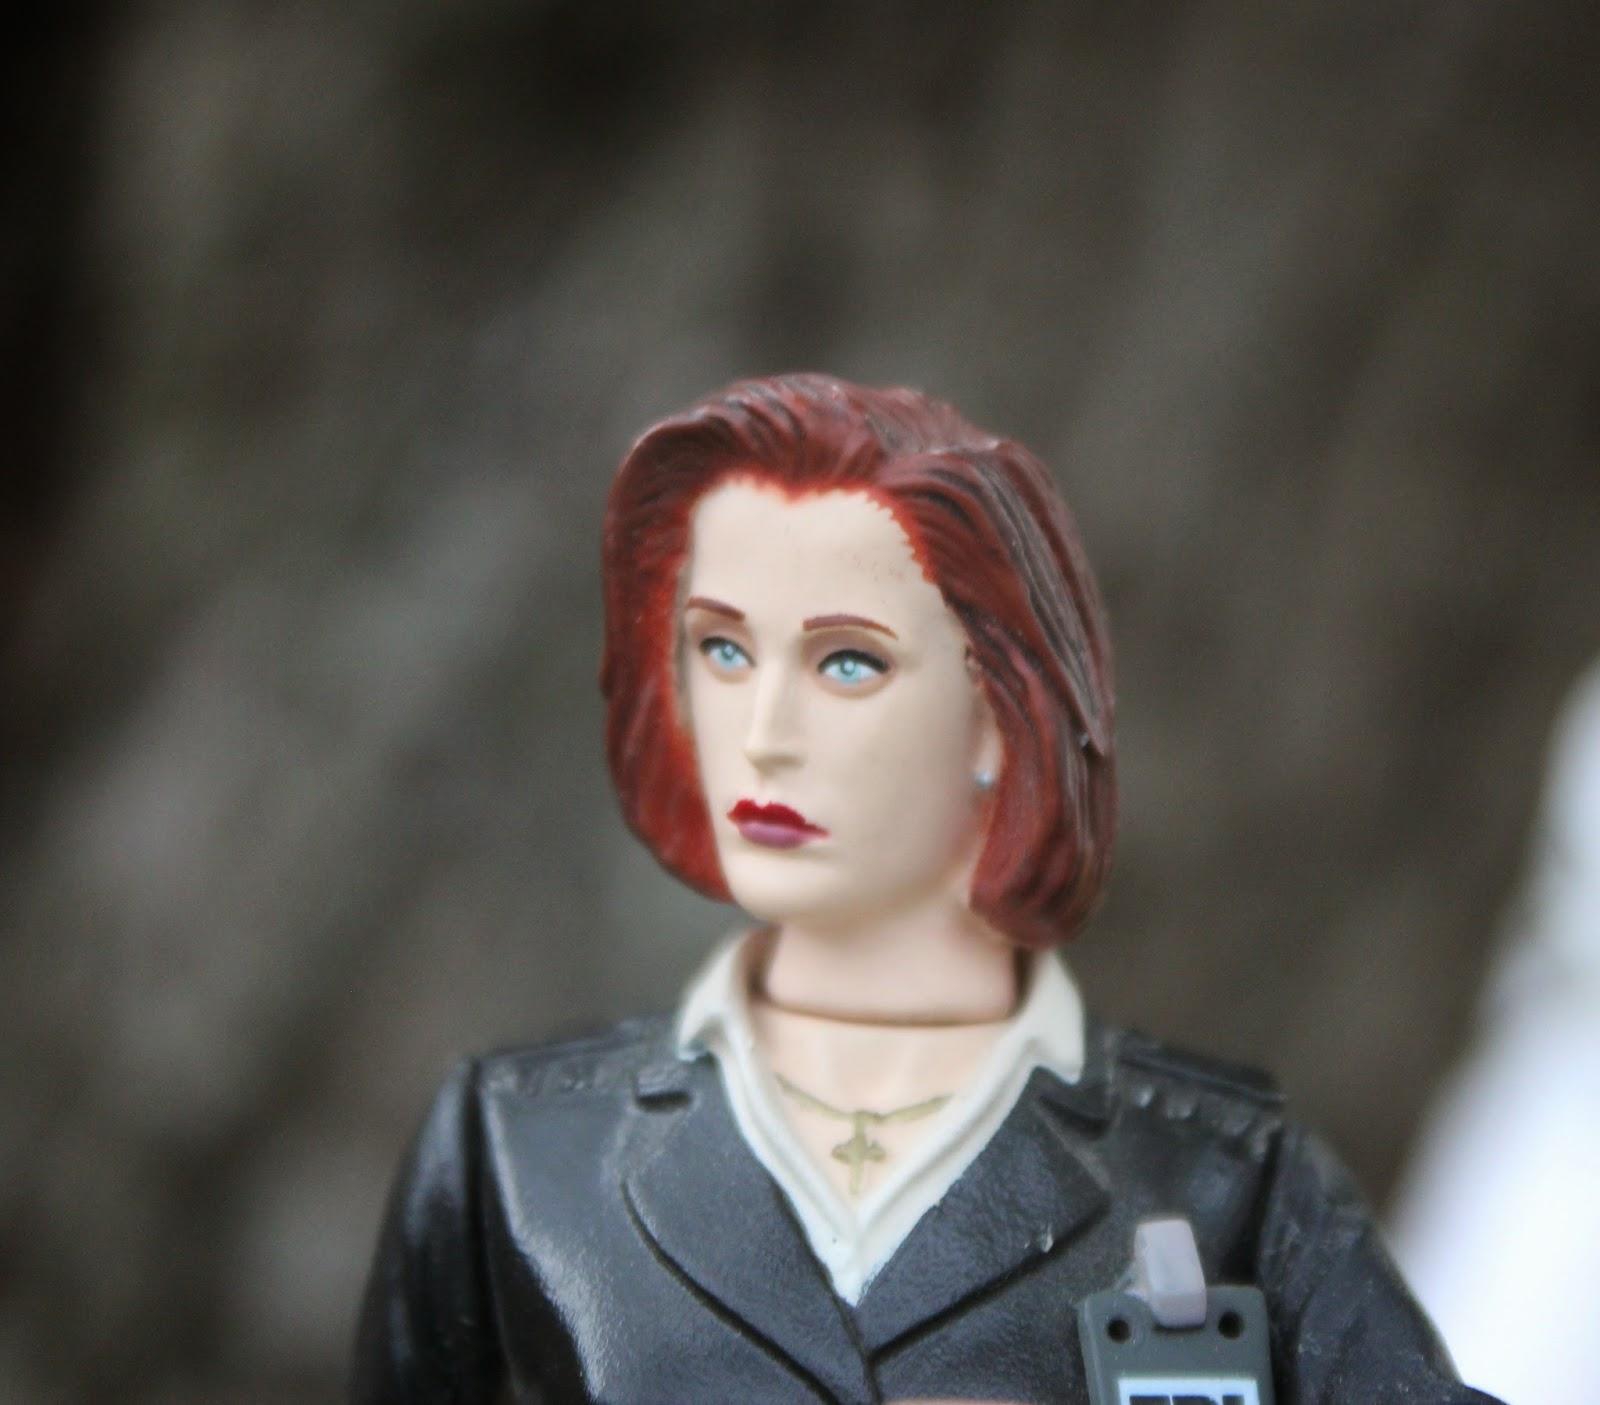 2018 Gillian Anderson as Dana Scully, X-Files